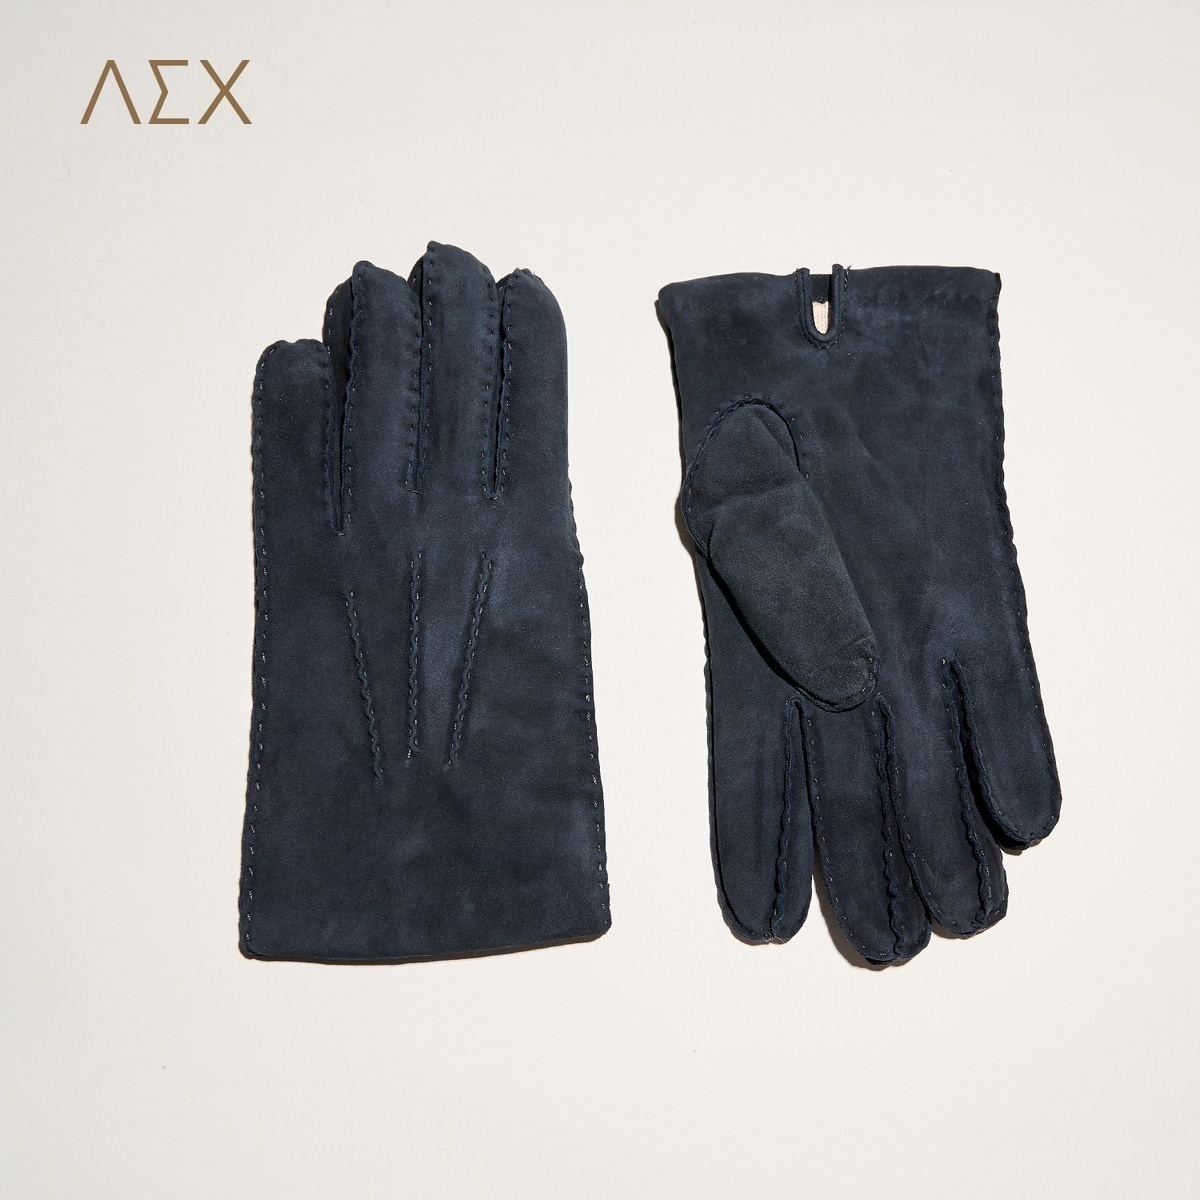 Мужские перчатки из овчины Артикул 576978316076